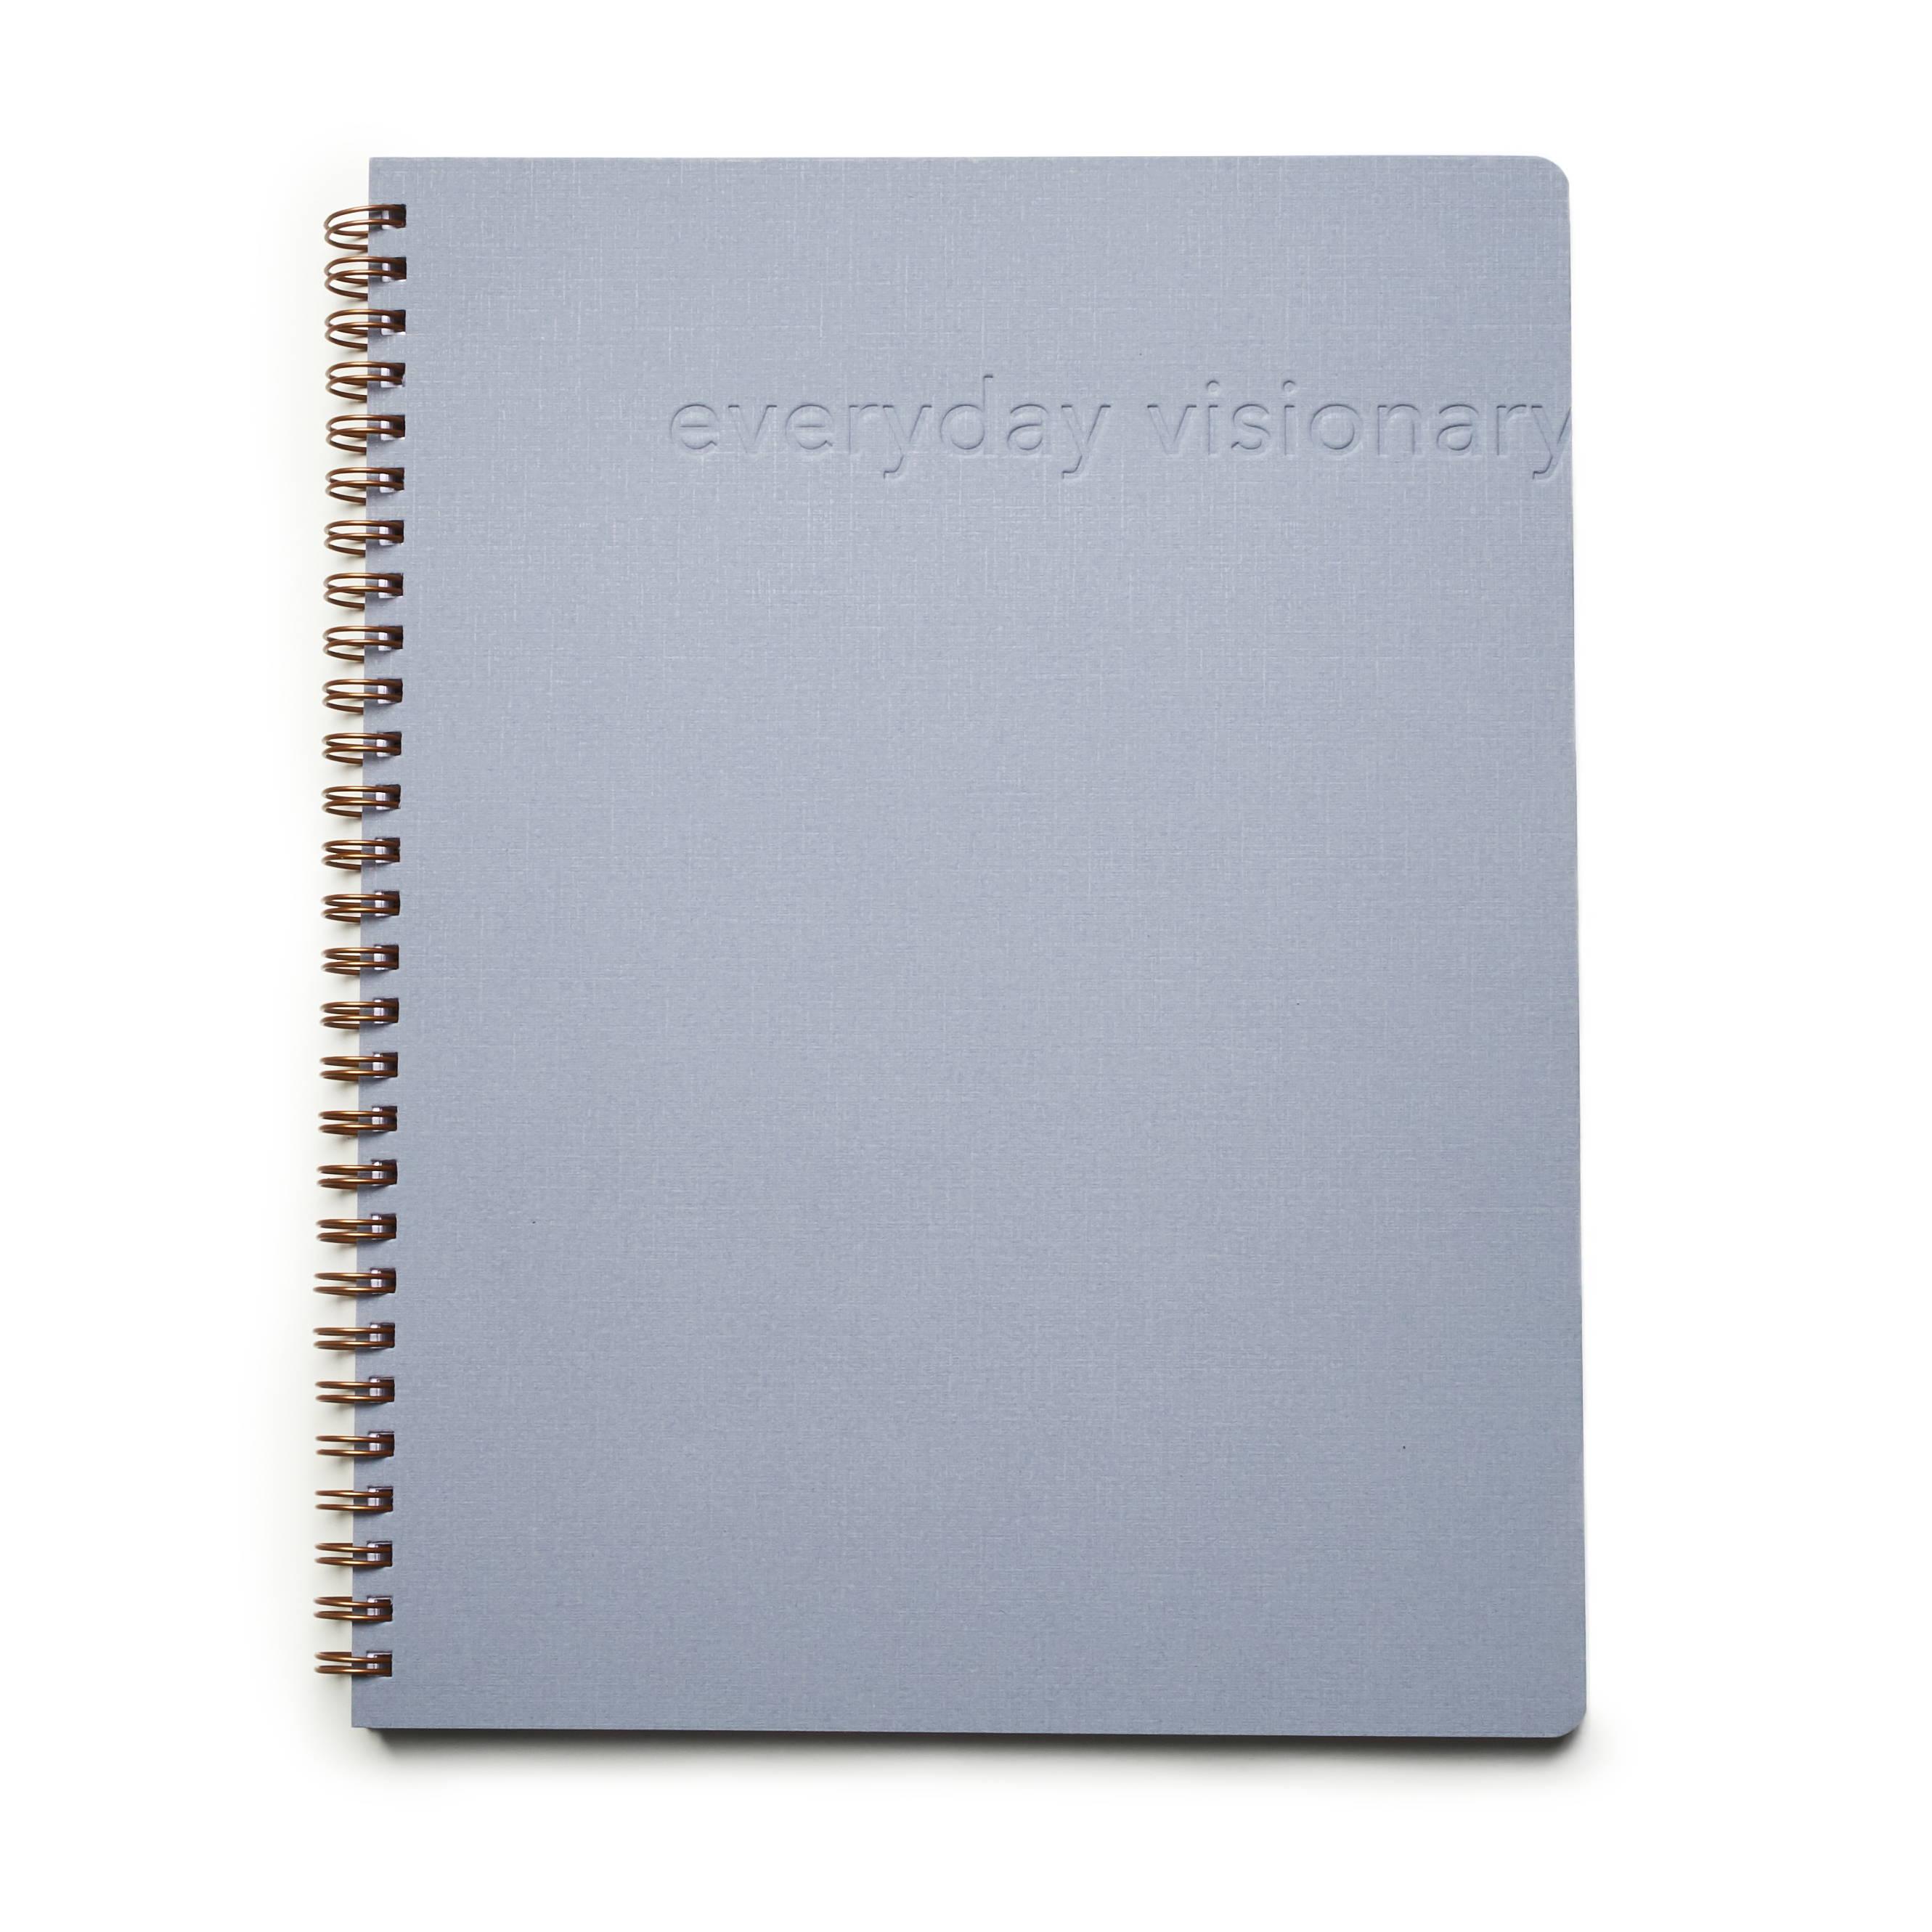 Everyday Visionary Grey